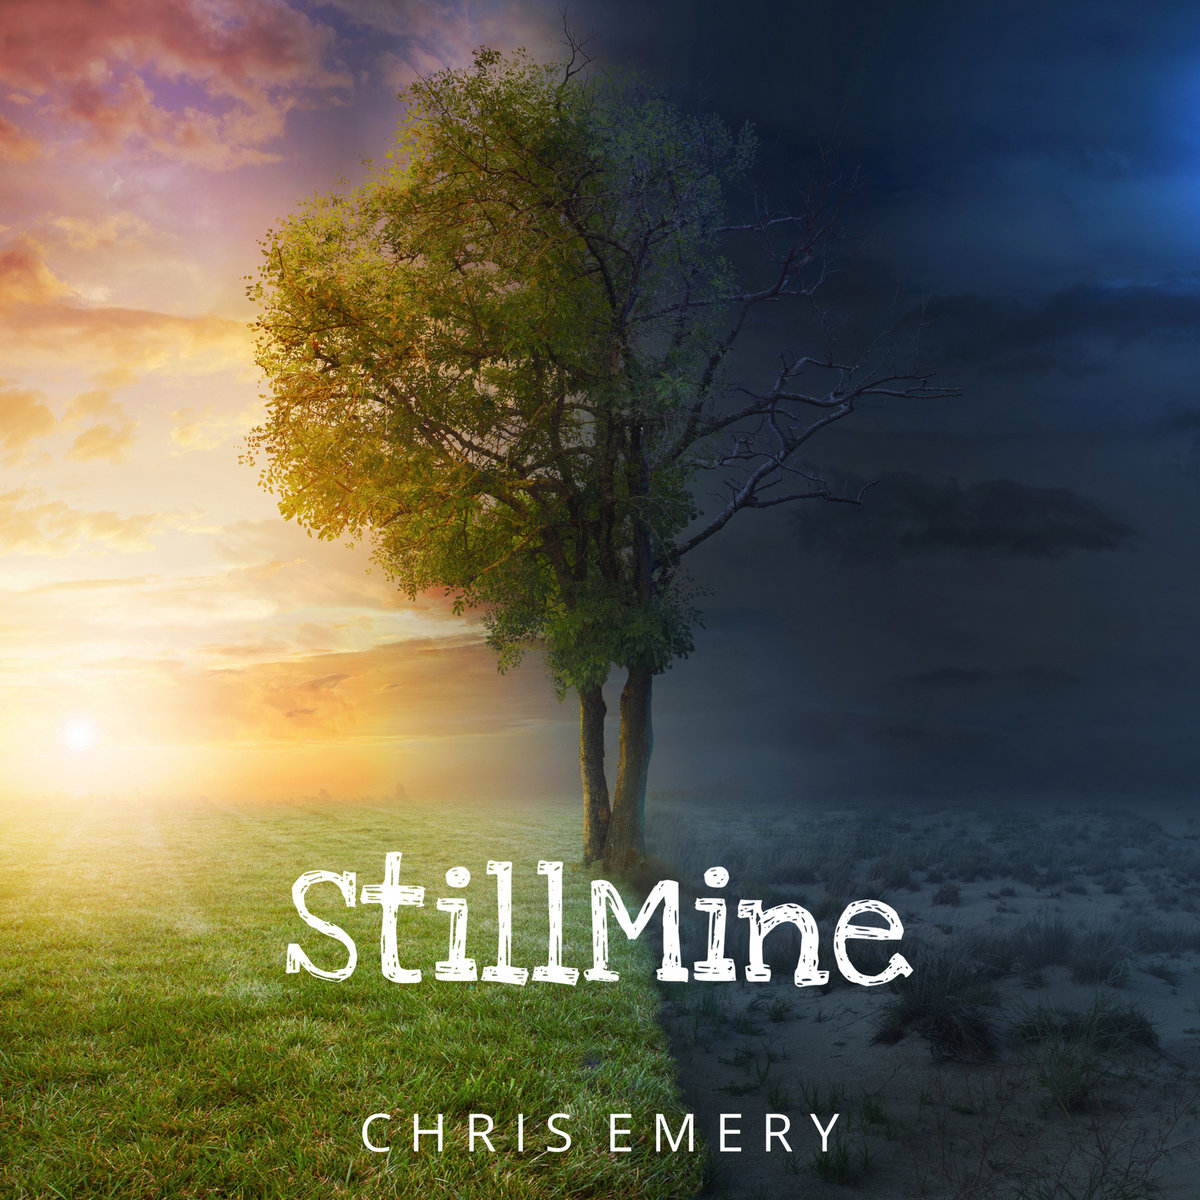 Still Mine by Chris Emery